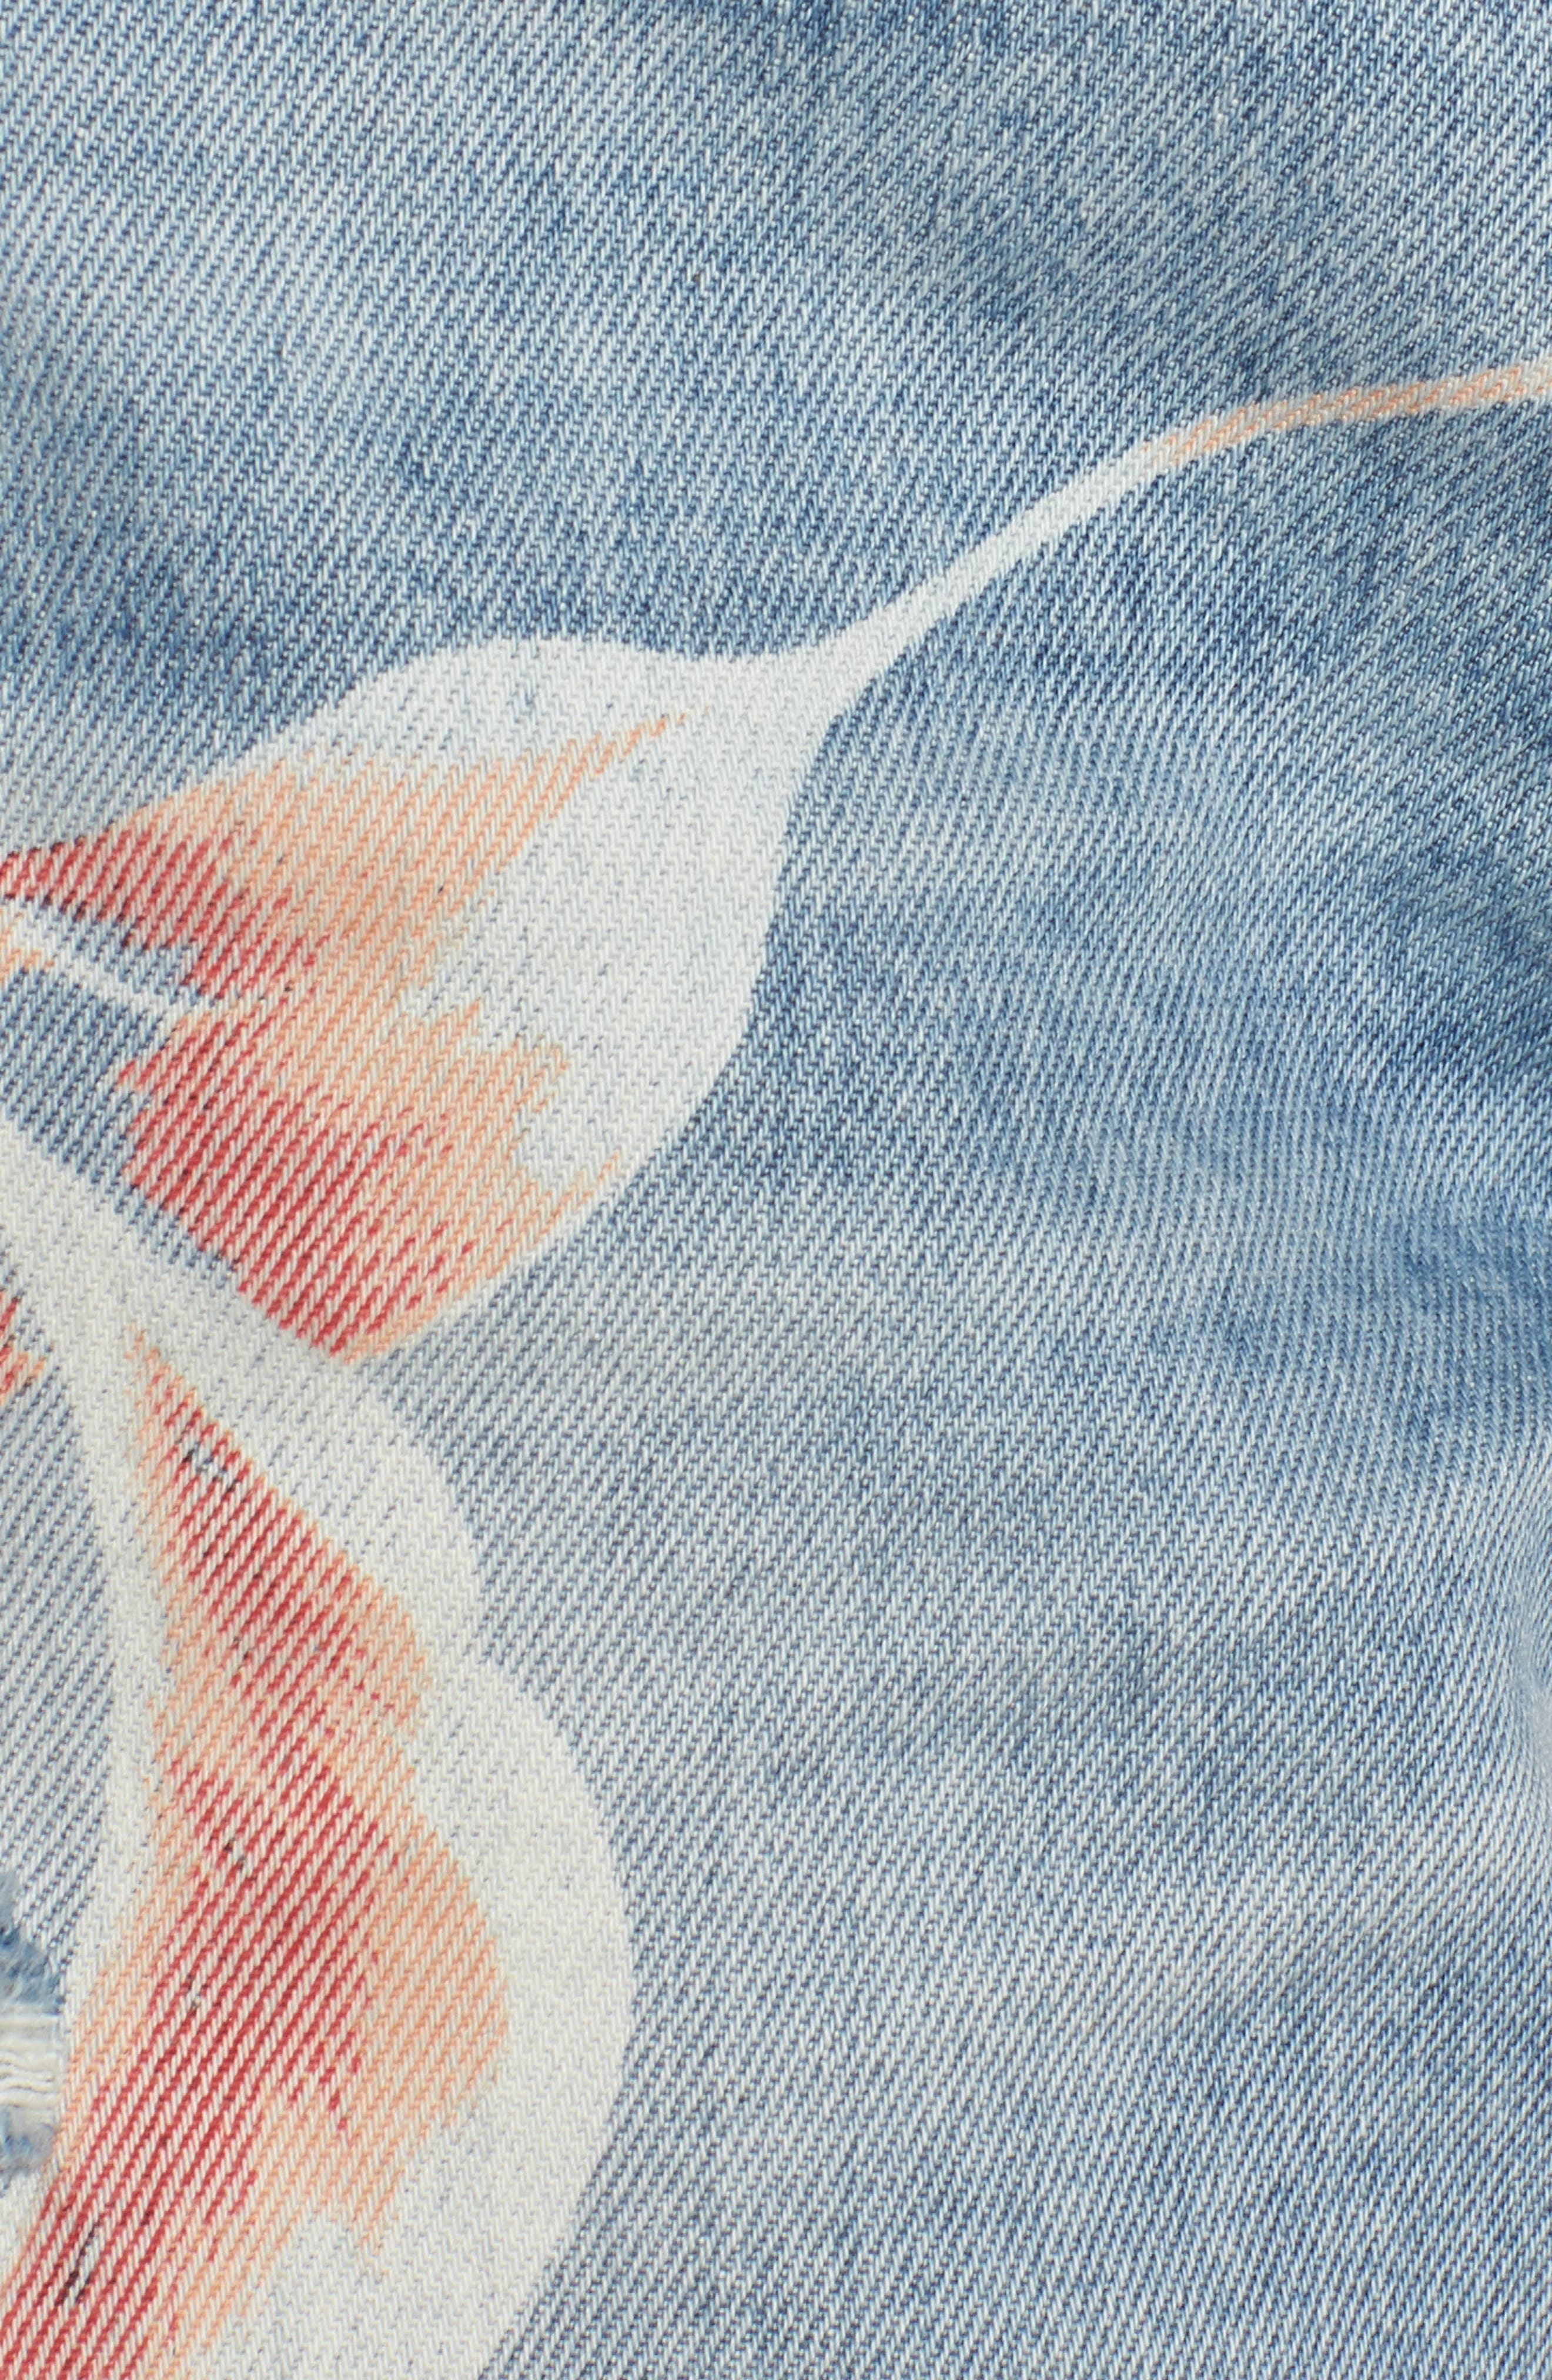 Valeri Painted Denim Shorts,                             Alternate thumbnail 6, color,                             In Bloom